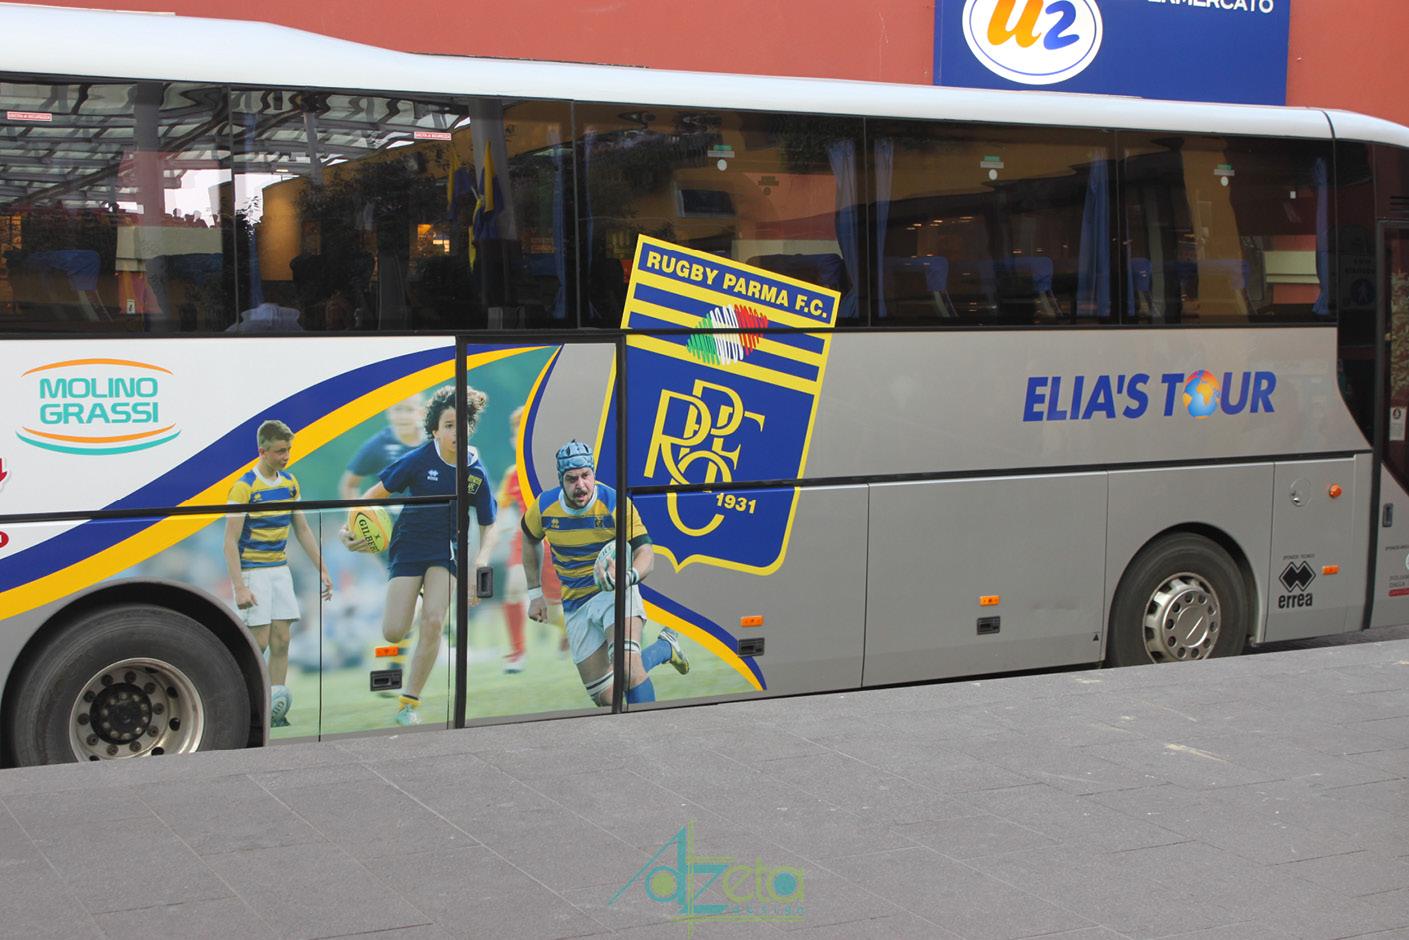 Rugby parma bus grafica